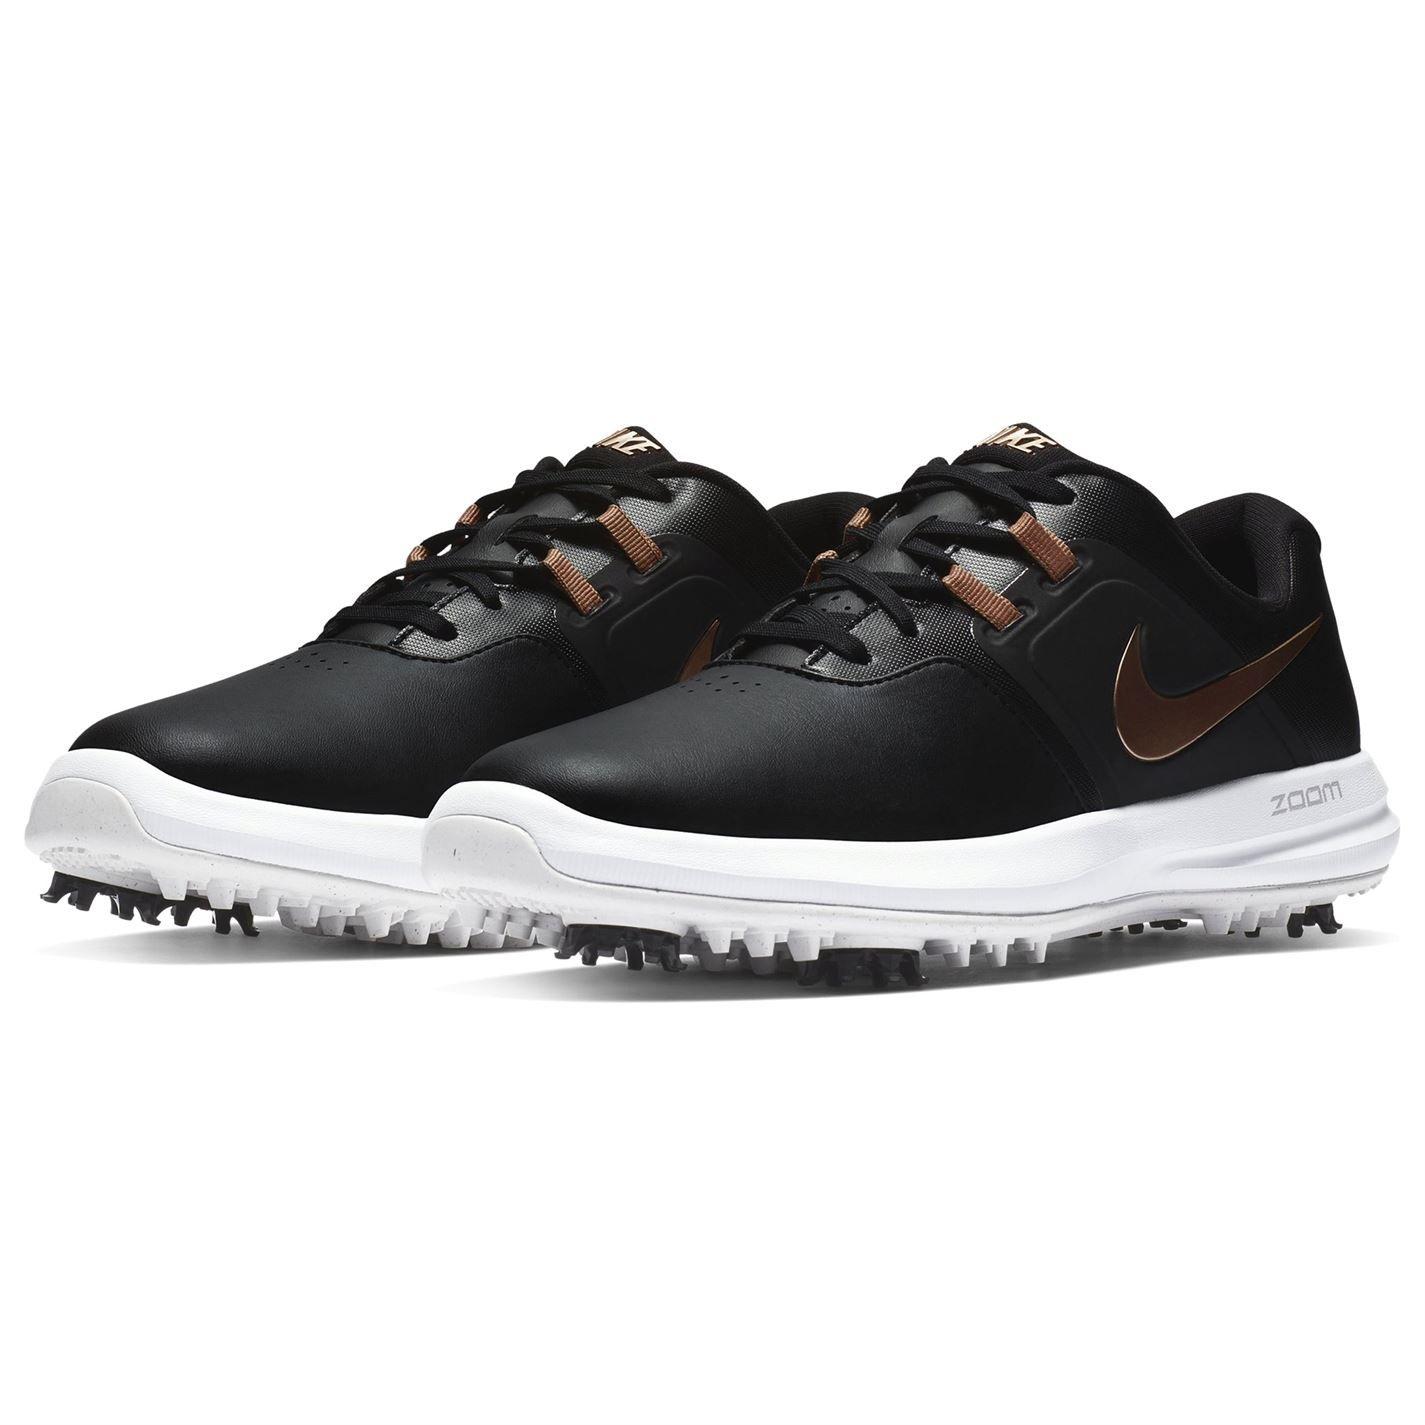 edaa2173576 Nike Air Zoom Victory Ladies Golf Shoes. Рейтинг: - 10%. Thumbnail 1 ...